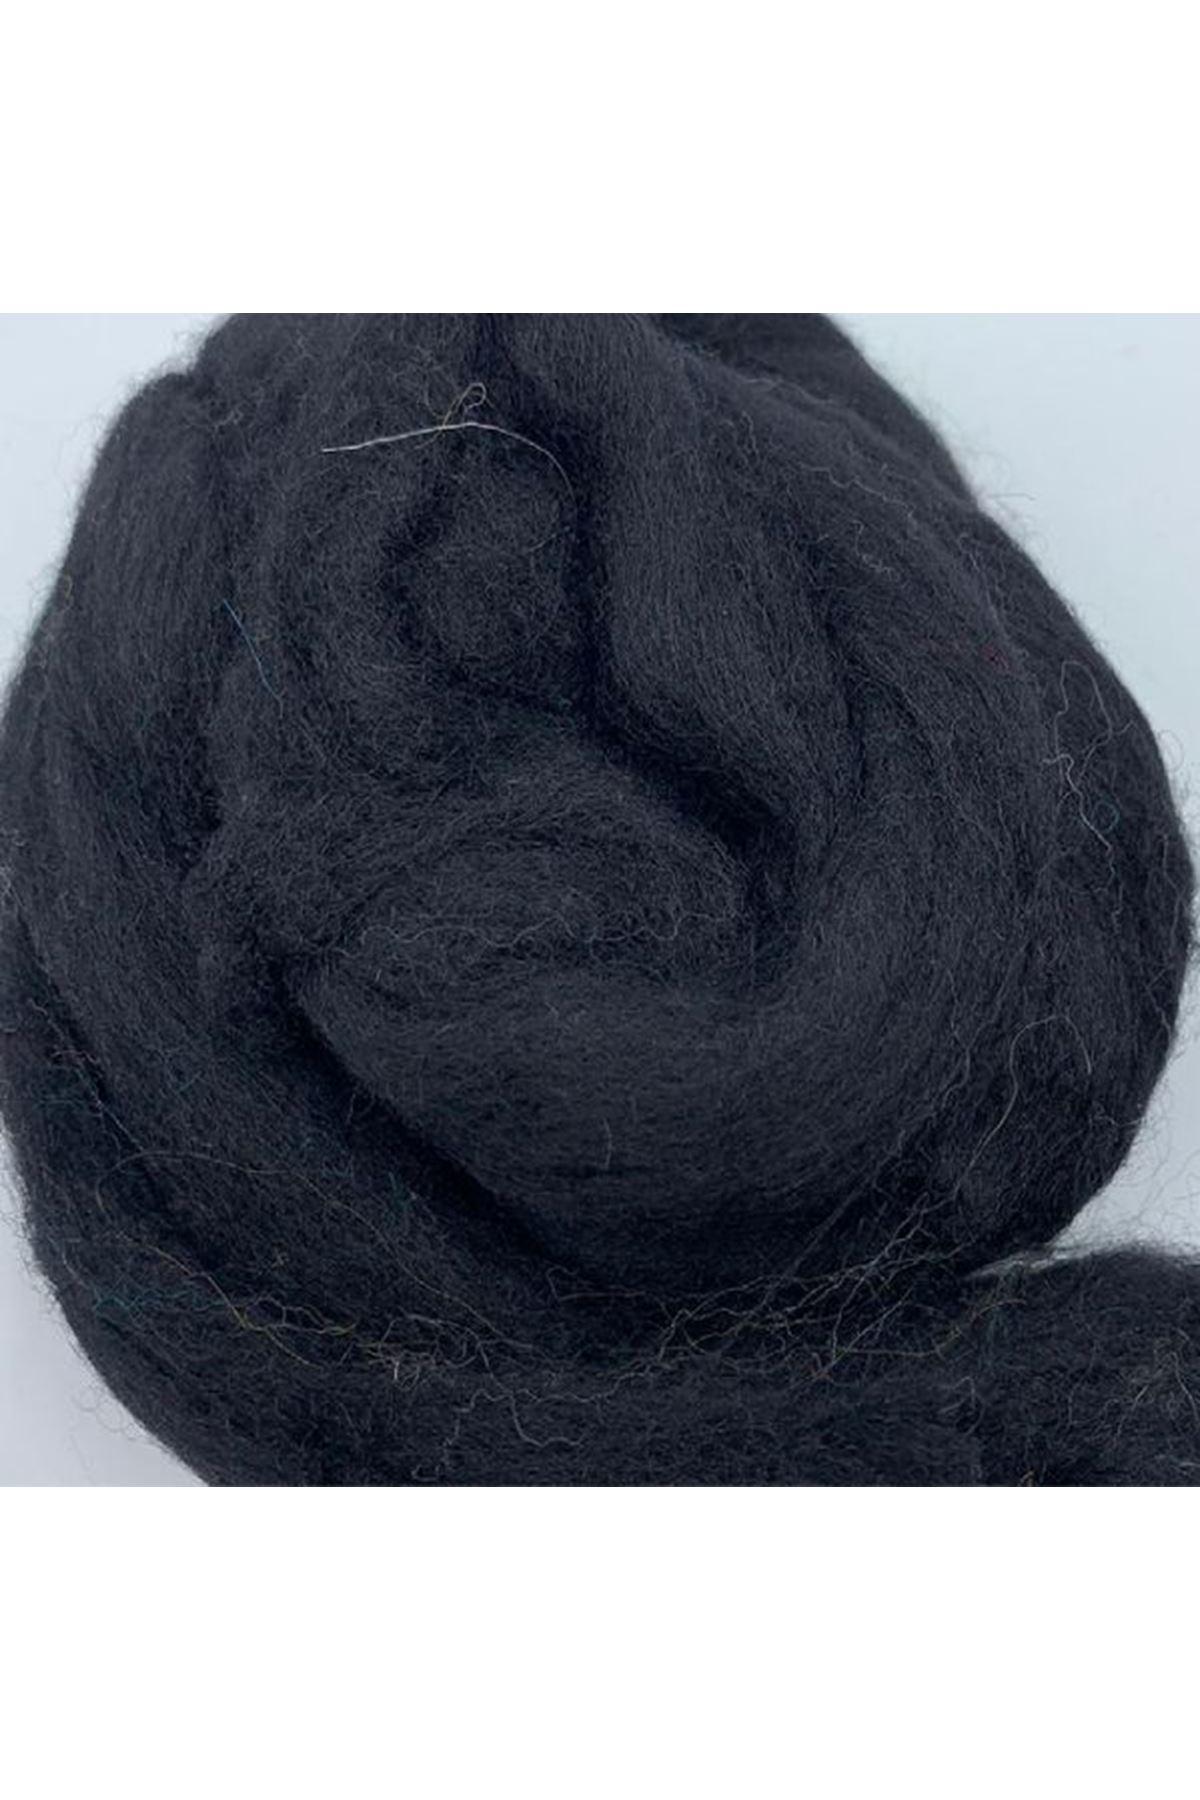 Saf Yün Keçe 25 gram 1 metre - Siyah